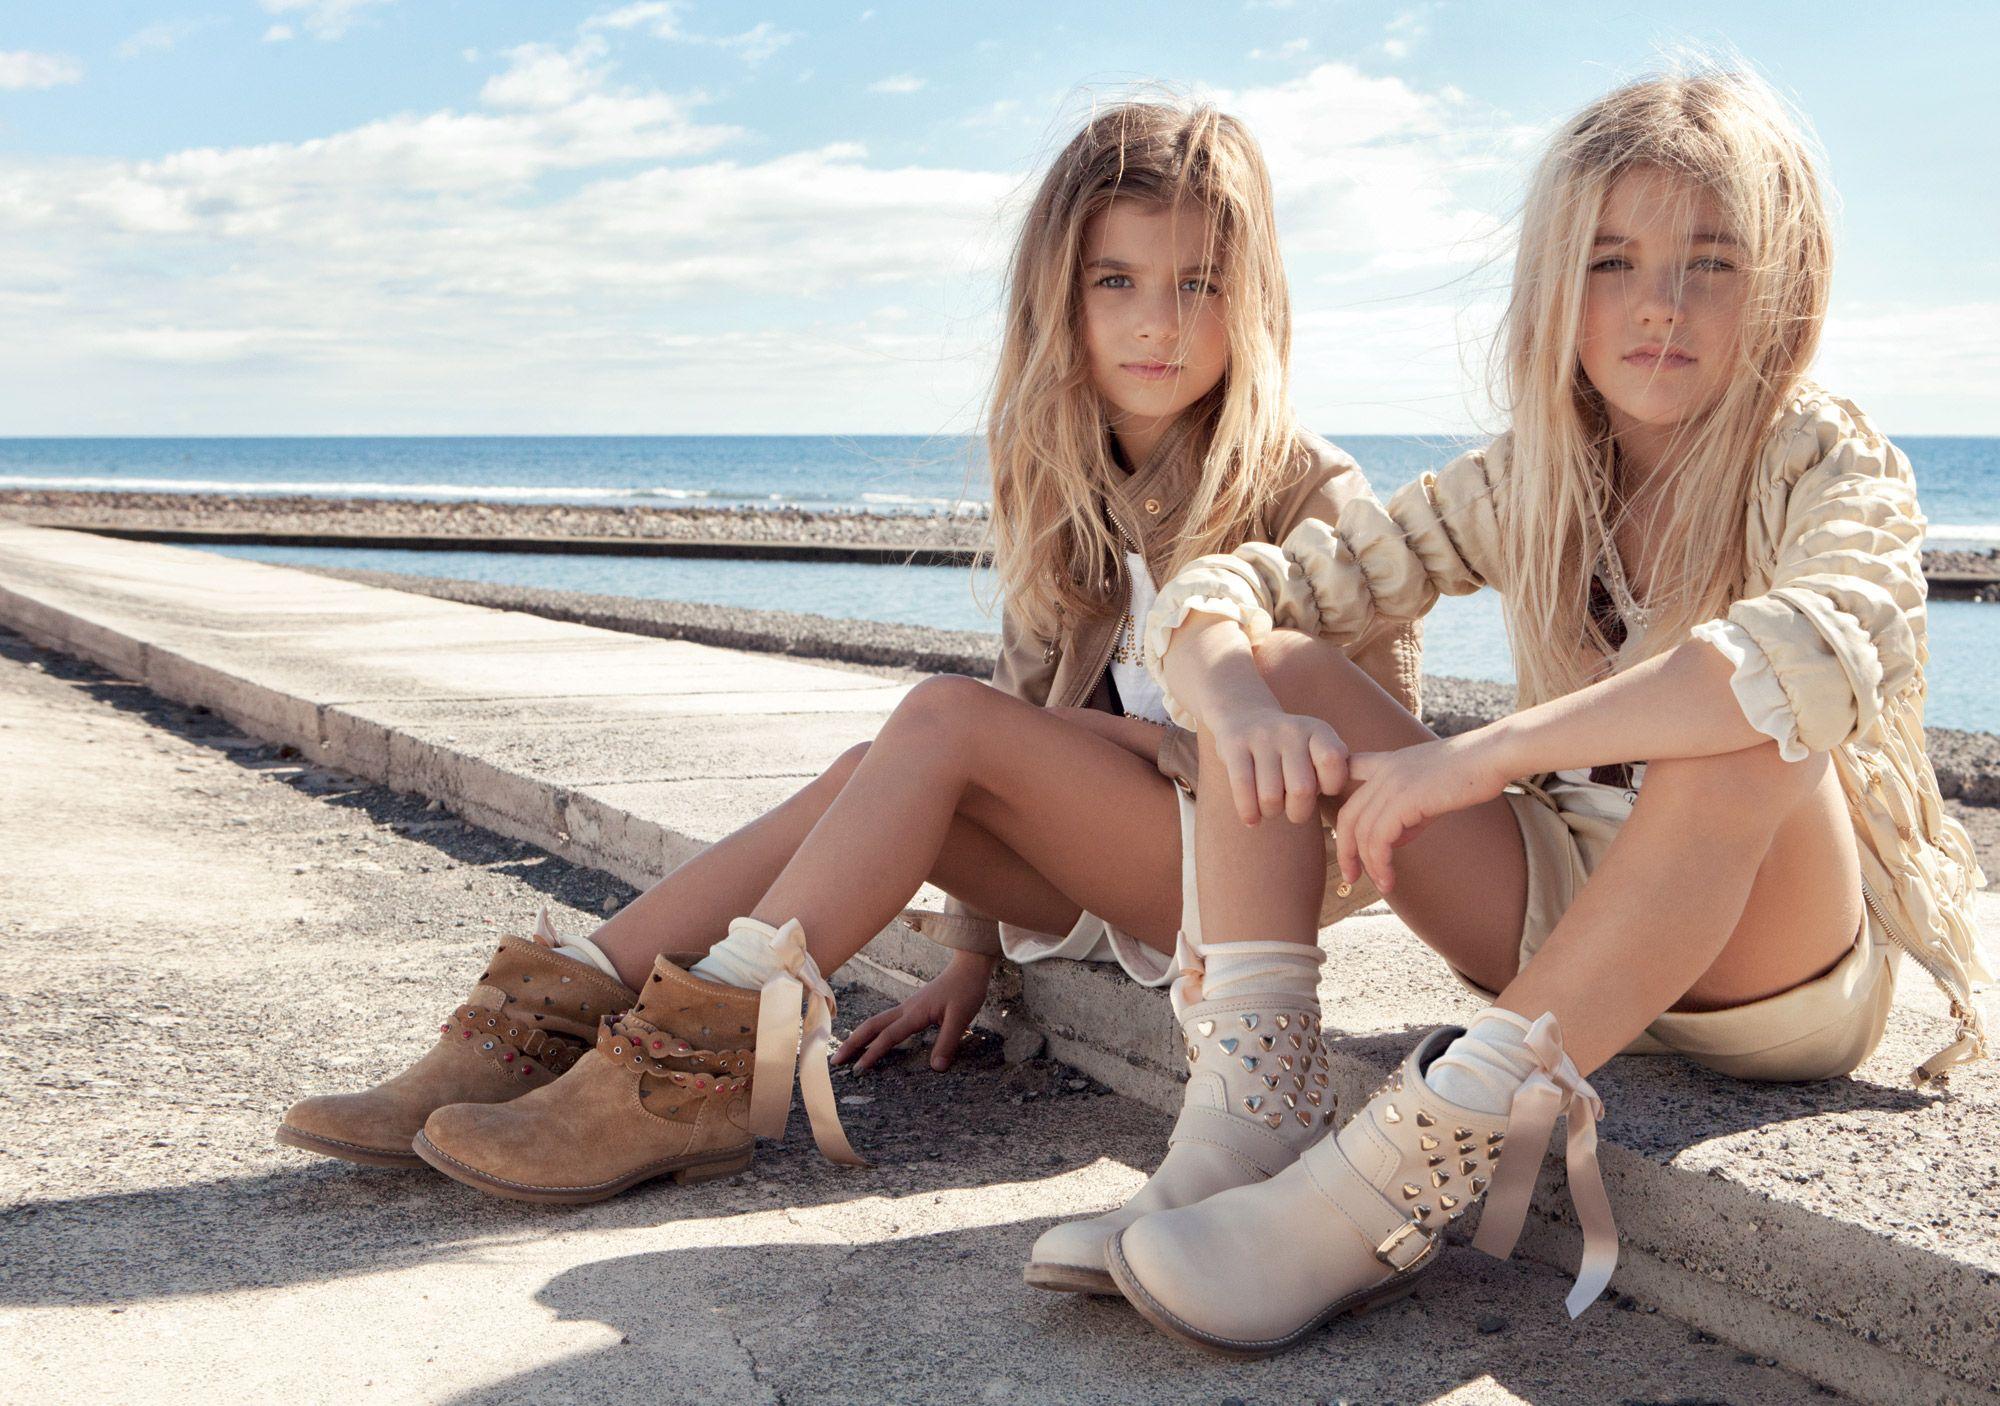 три девчонки шалят - 10